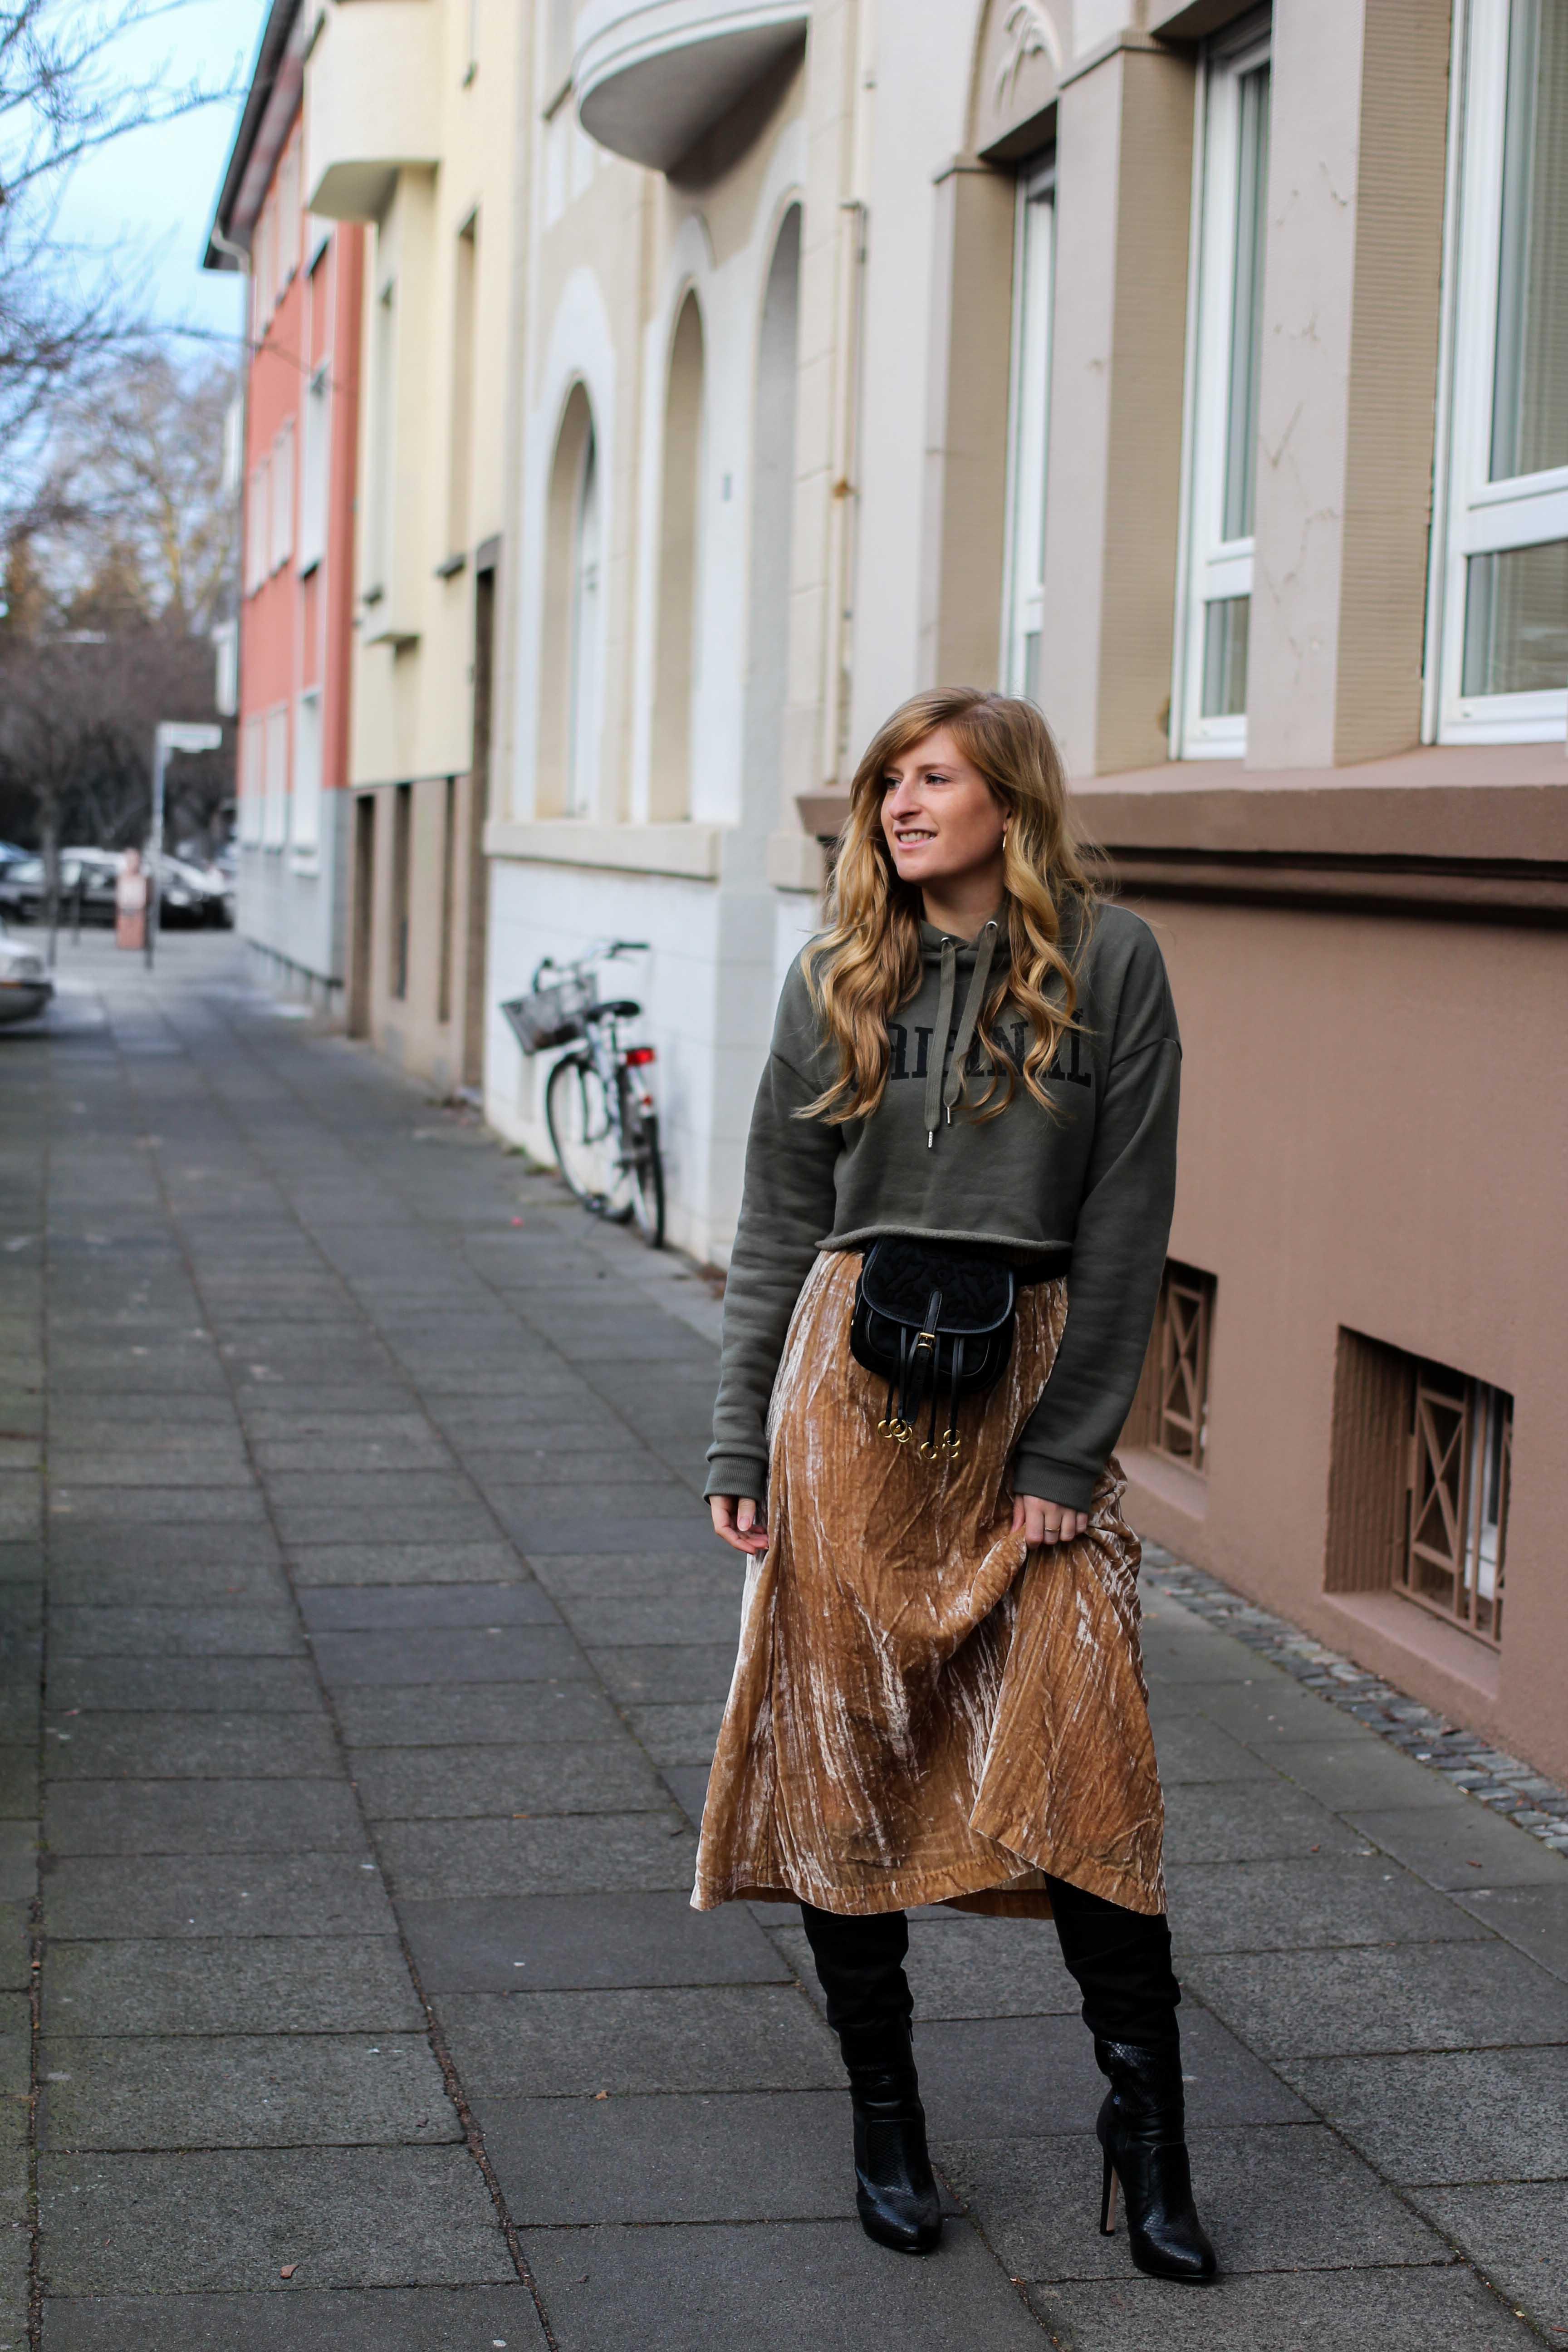 Trendtasche 2019 Gürteltasche kombiniern Gürteltasche Prada Streetstyle Outfit Bonn Frühling Look Crop Pullover 3